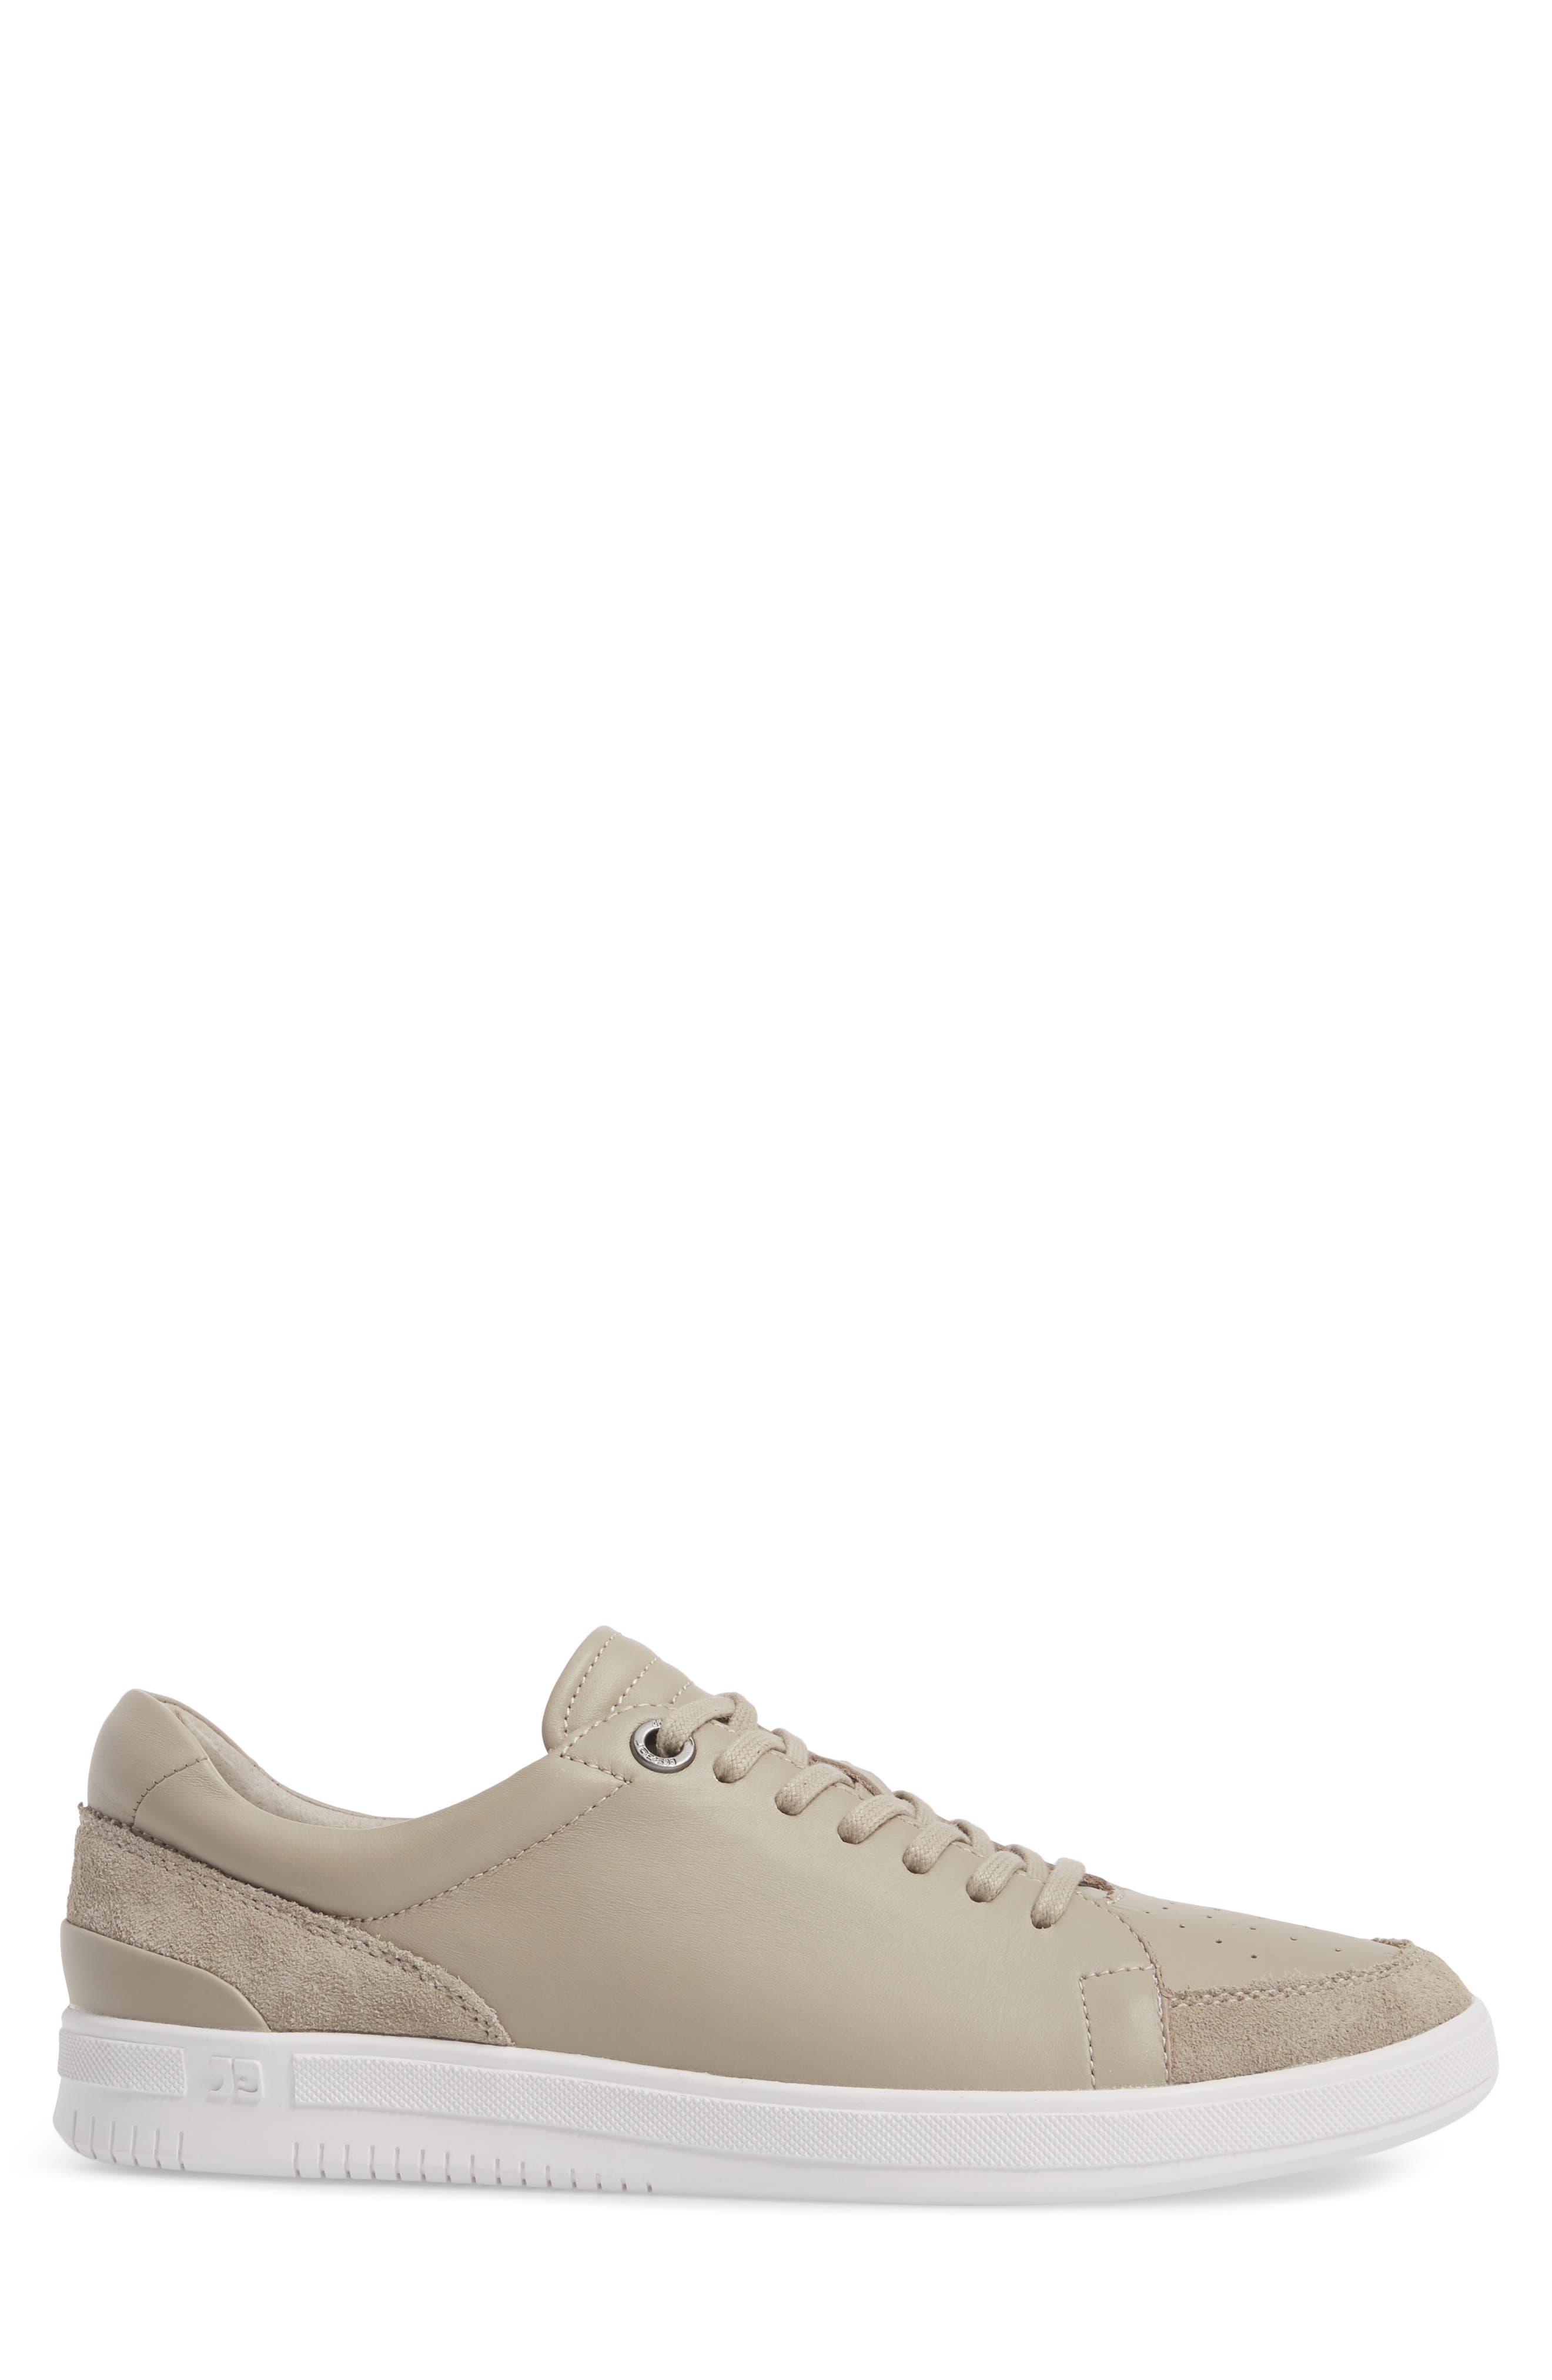 Joe Classic Low Top Sneaker,                             Alternate thumbnail 3, color,                             Stone Leather